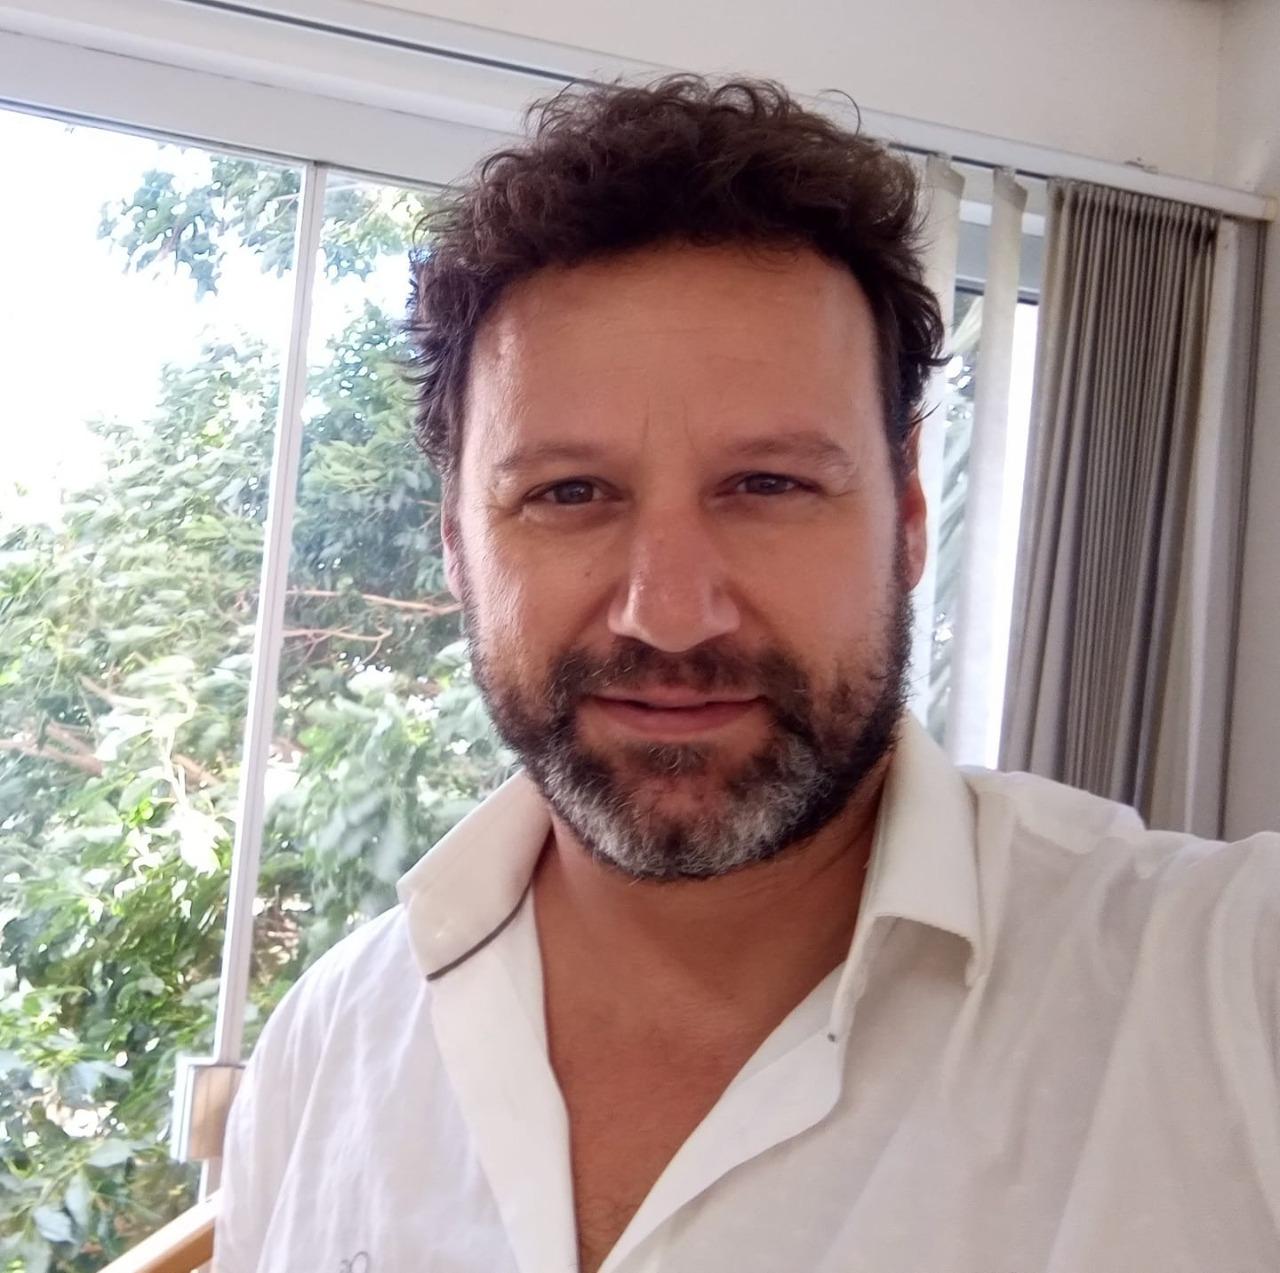 Cantor Motta da dupla Fernando e Motta falece vítima da Covid-19